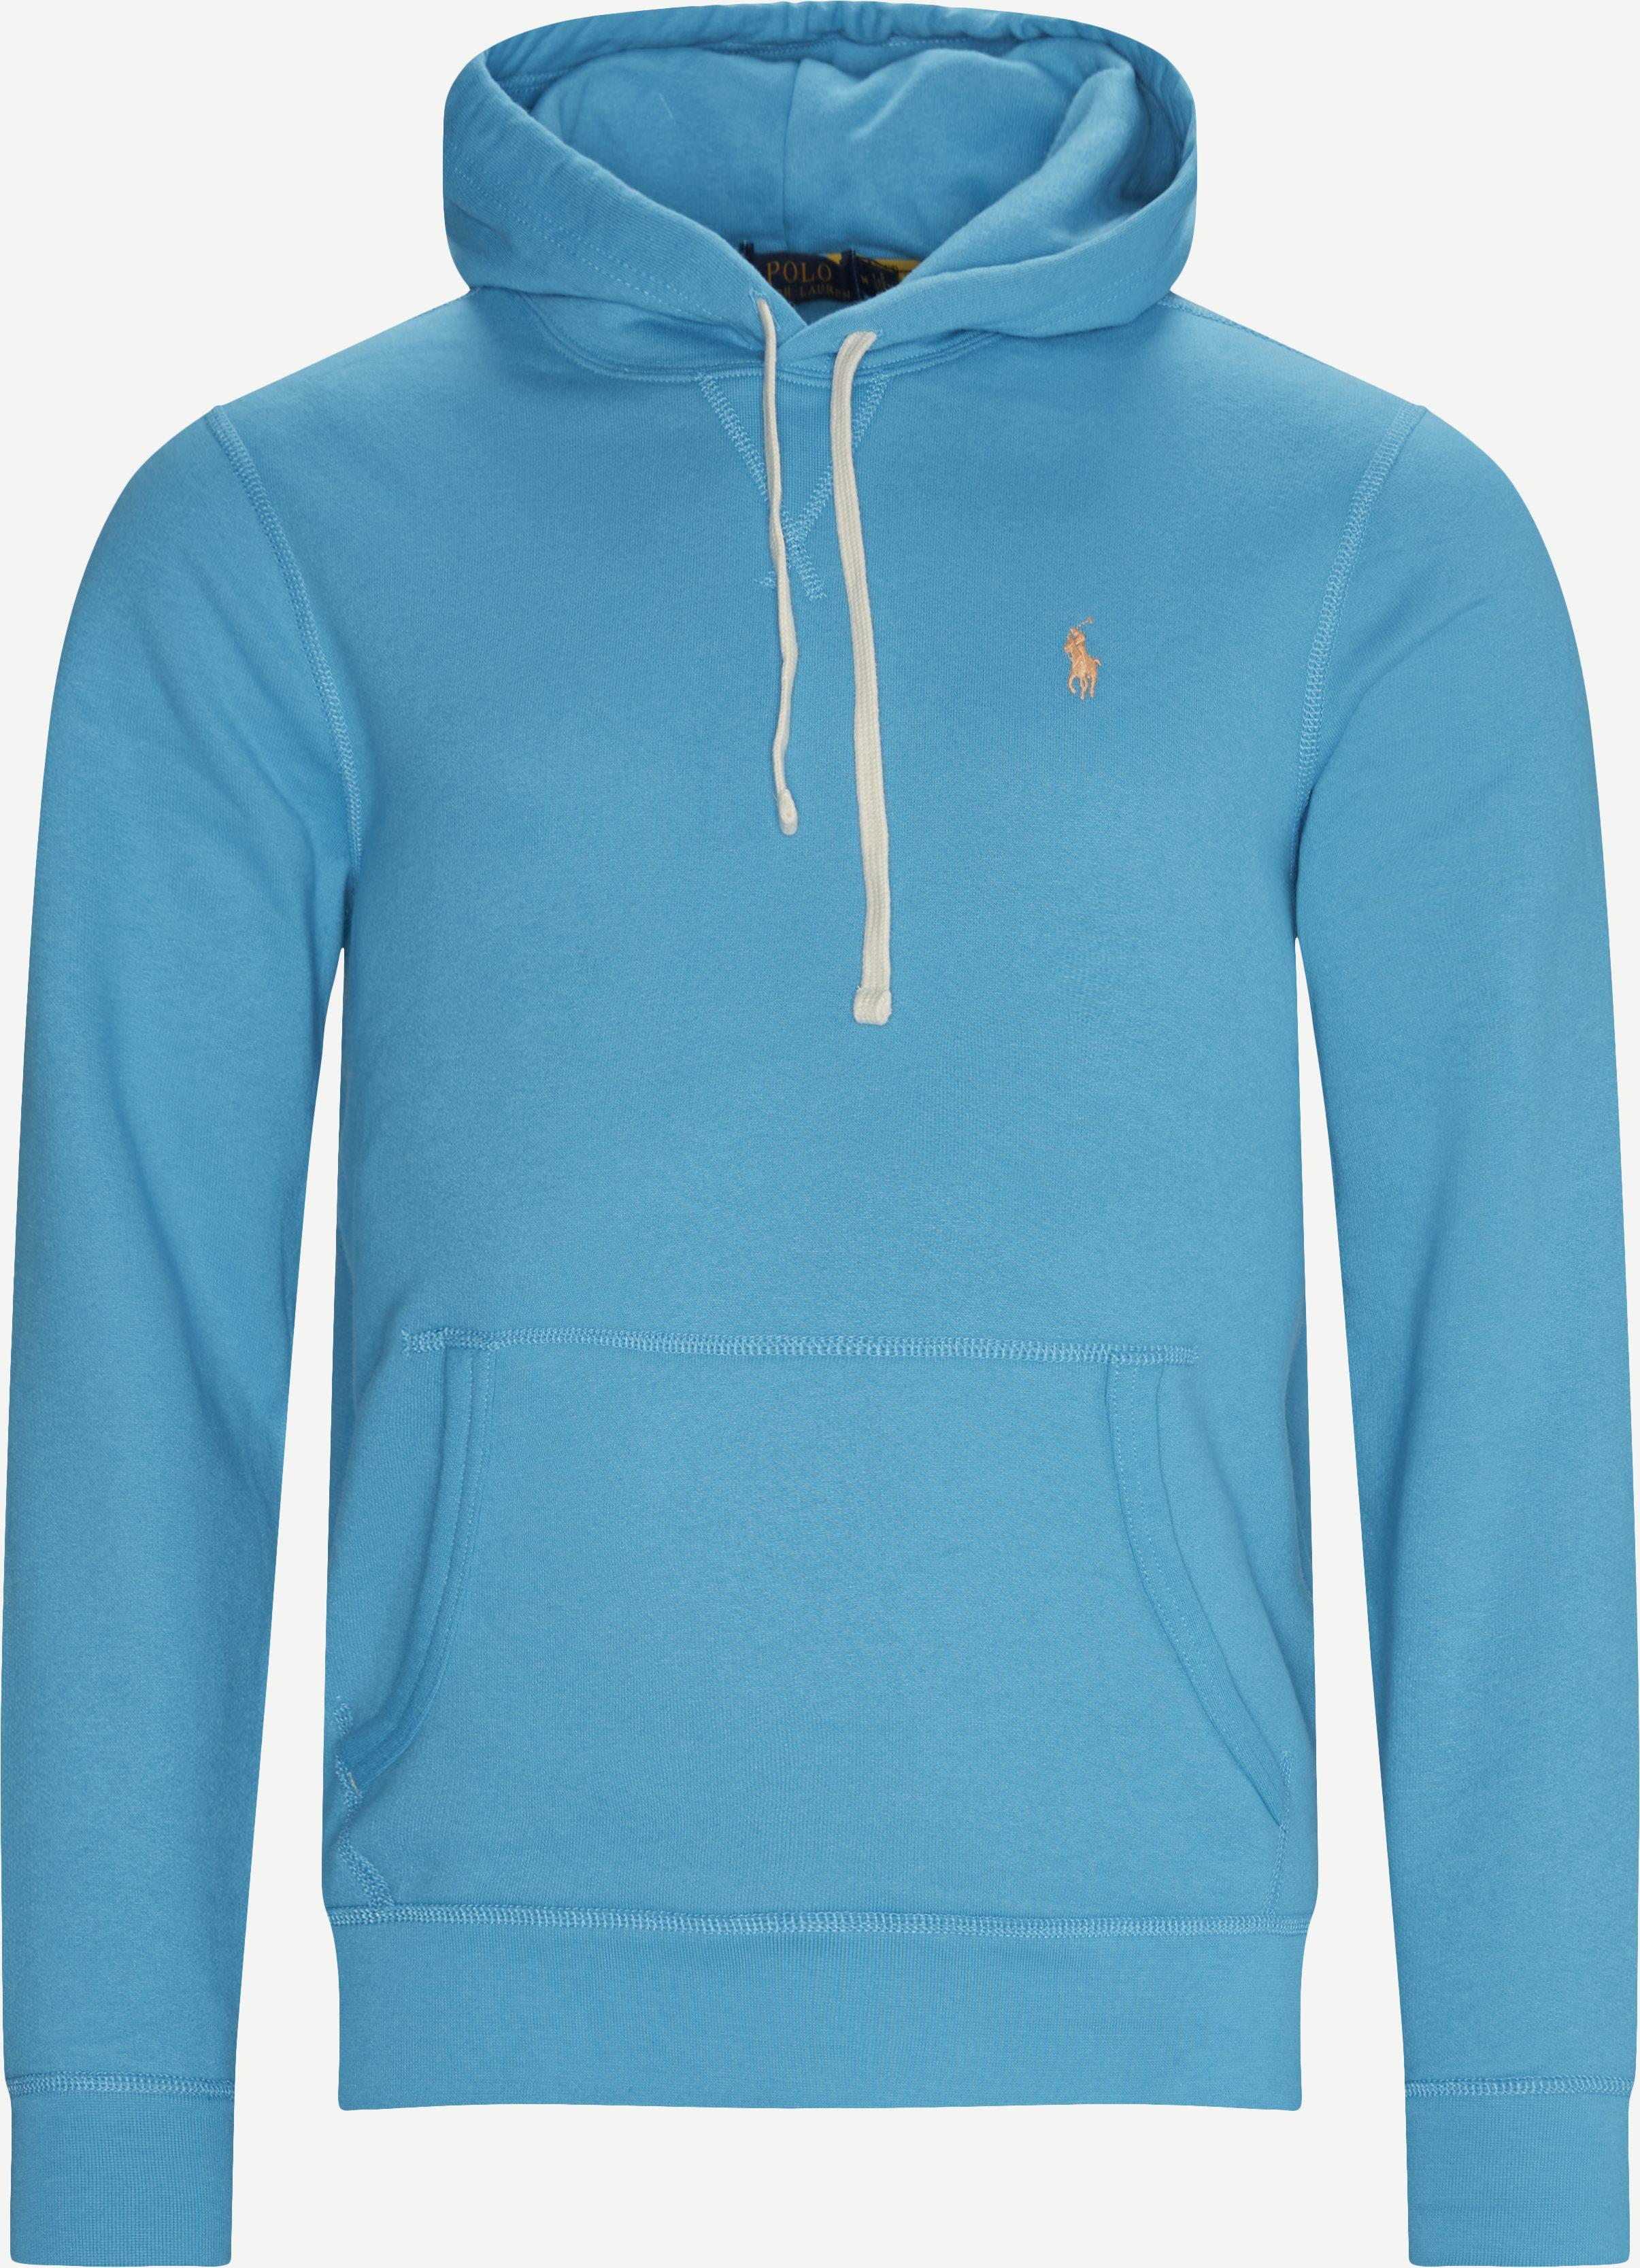 Sweatshirts - Regular - Türkis